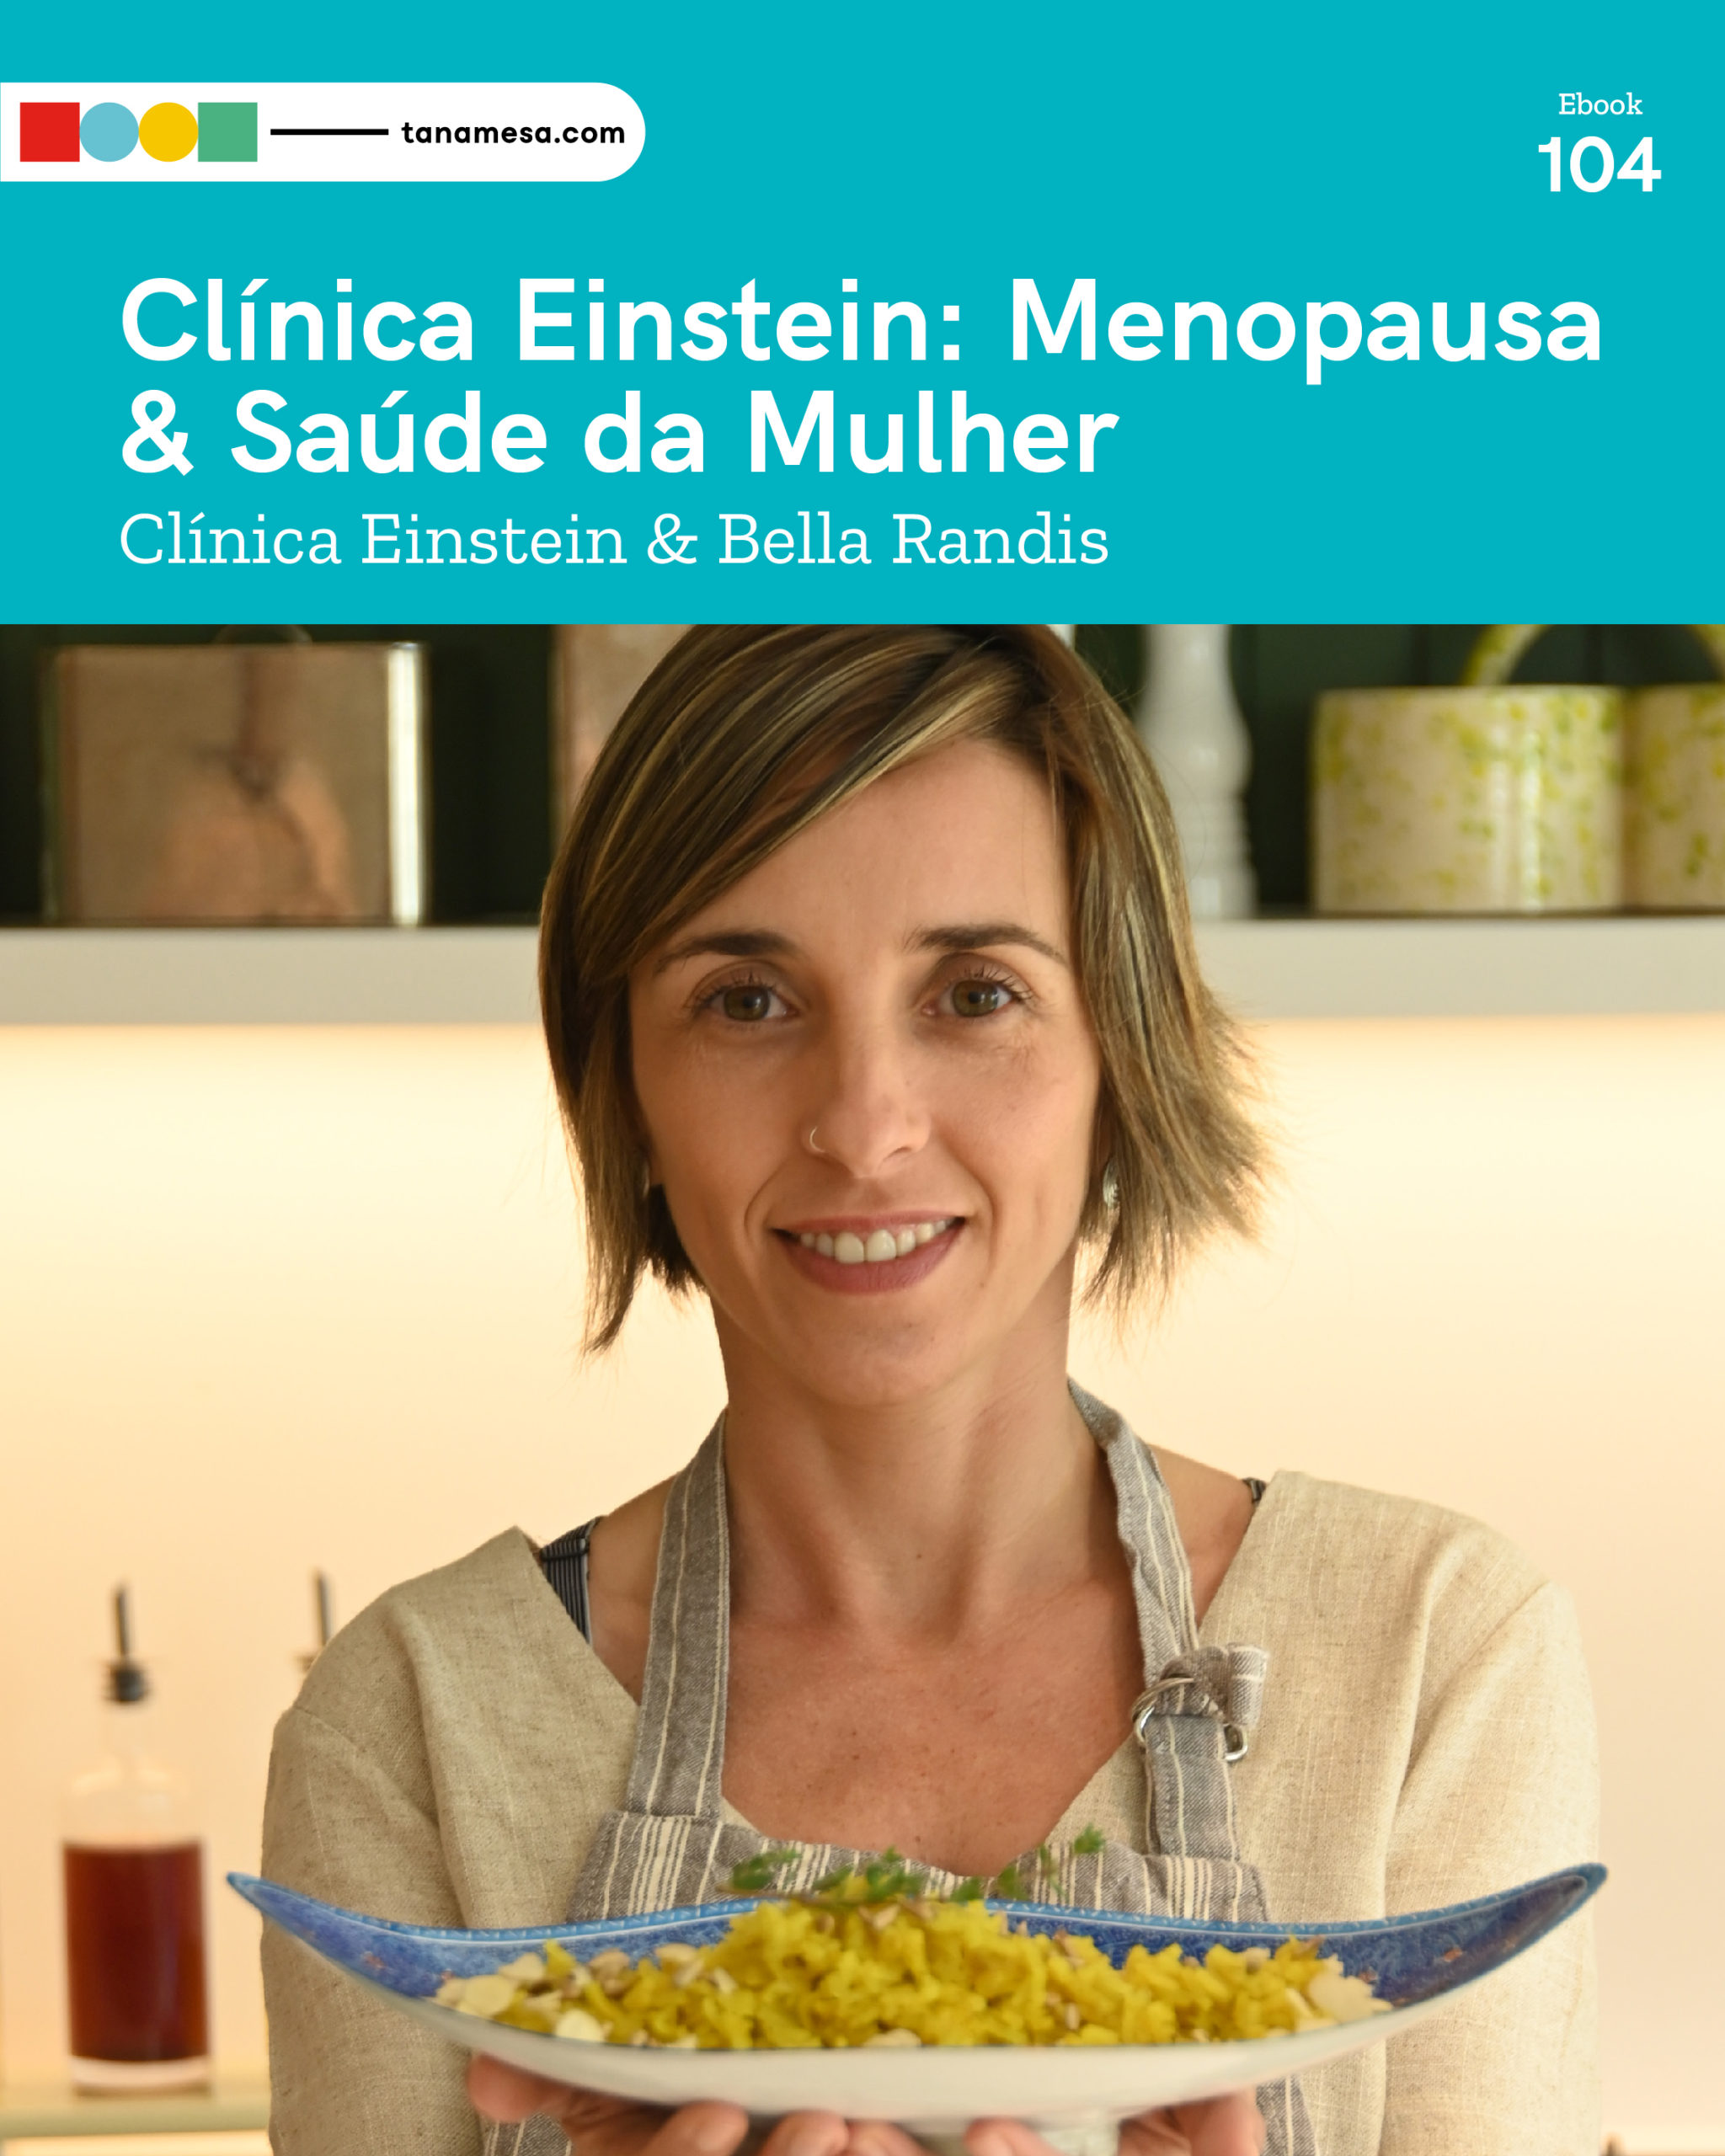 104. Clínica Einstein: Menopausa & Saúde da Mulher